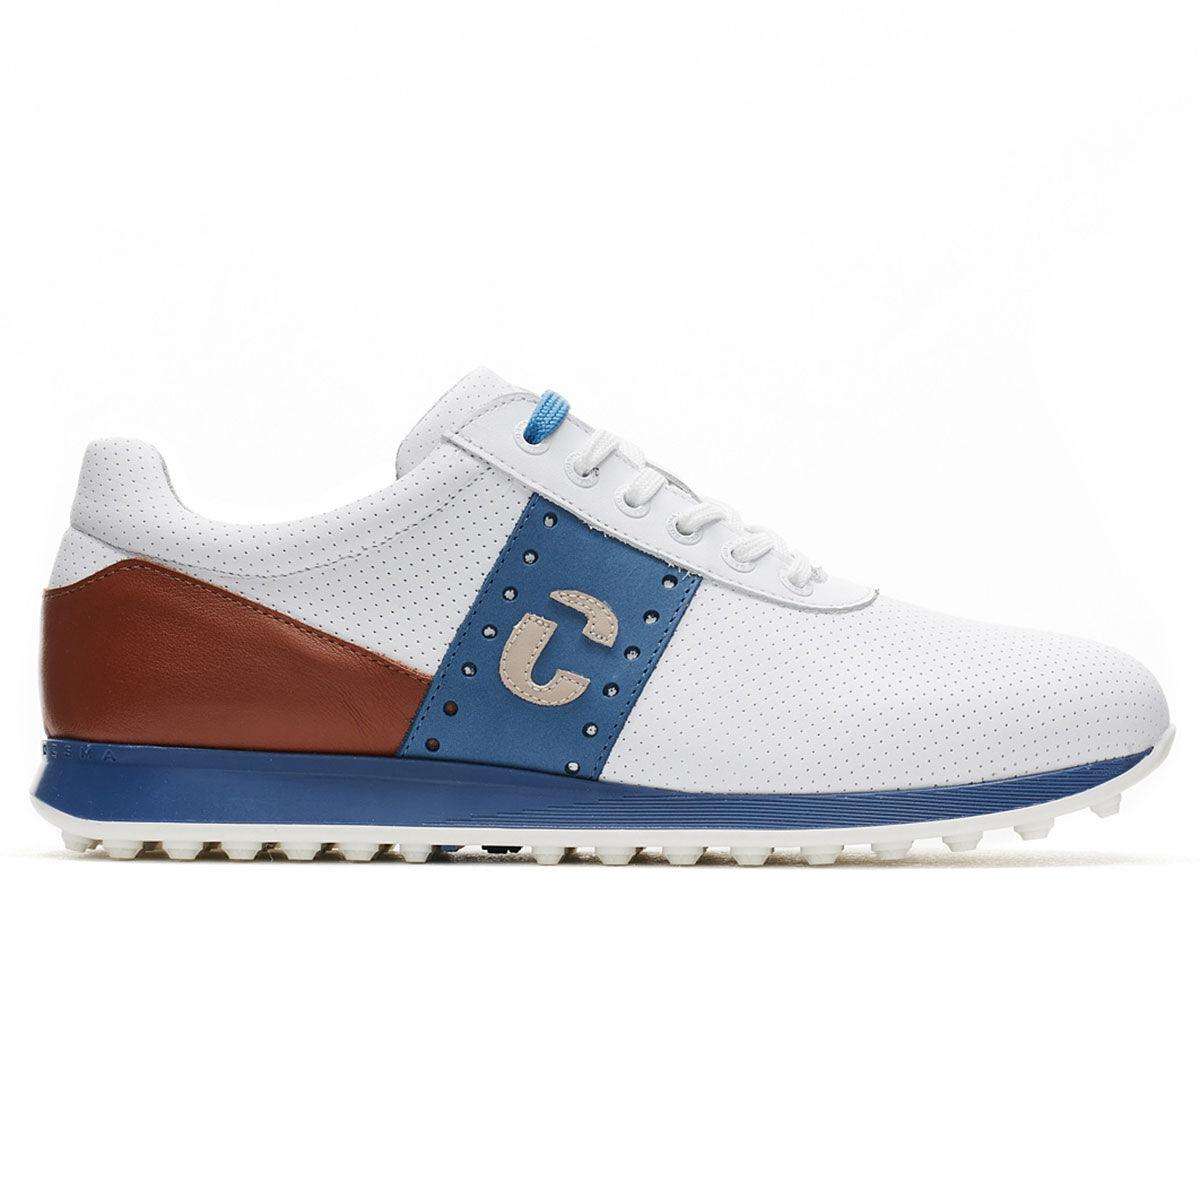 Duca Del Cosma Belair Golf Shoes, Mens, White/cognac, 10   American Golf